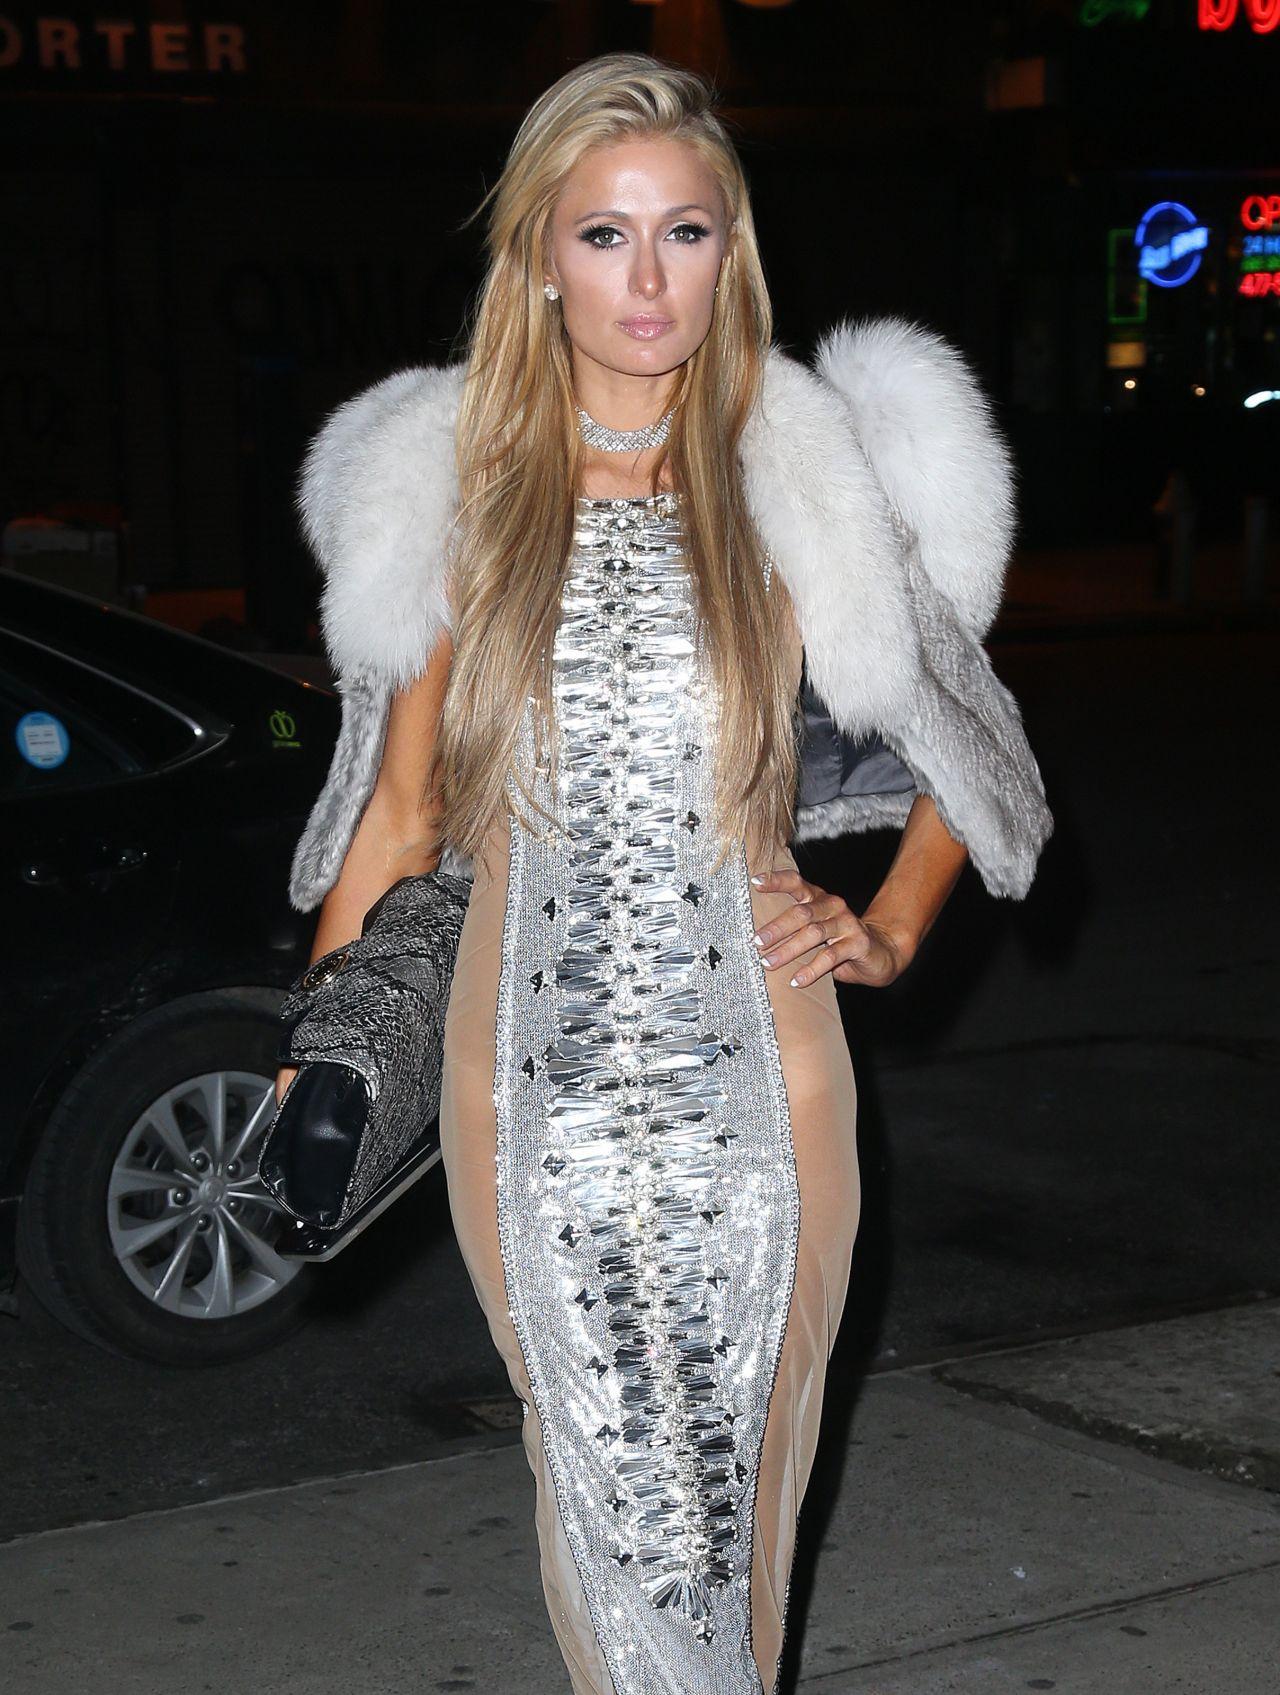 Paris Hilton - Night Out in New York City 2/14/ 2017 Paris Hilton